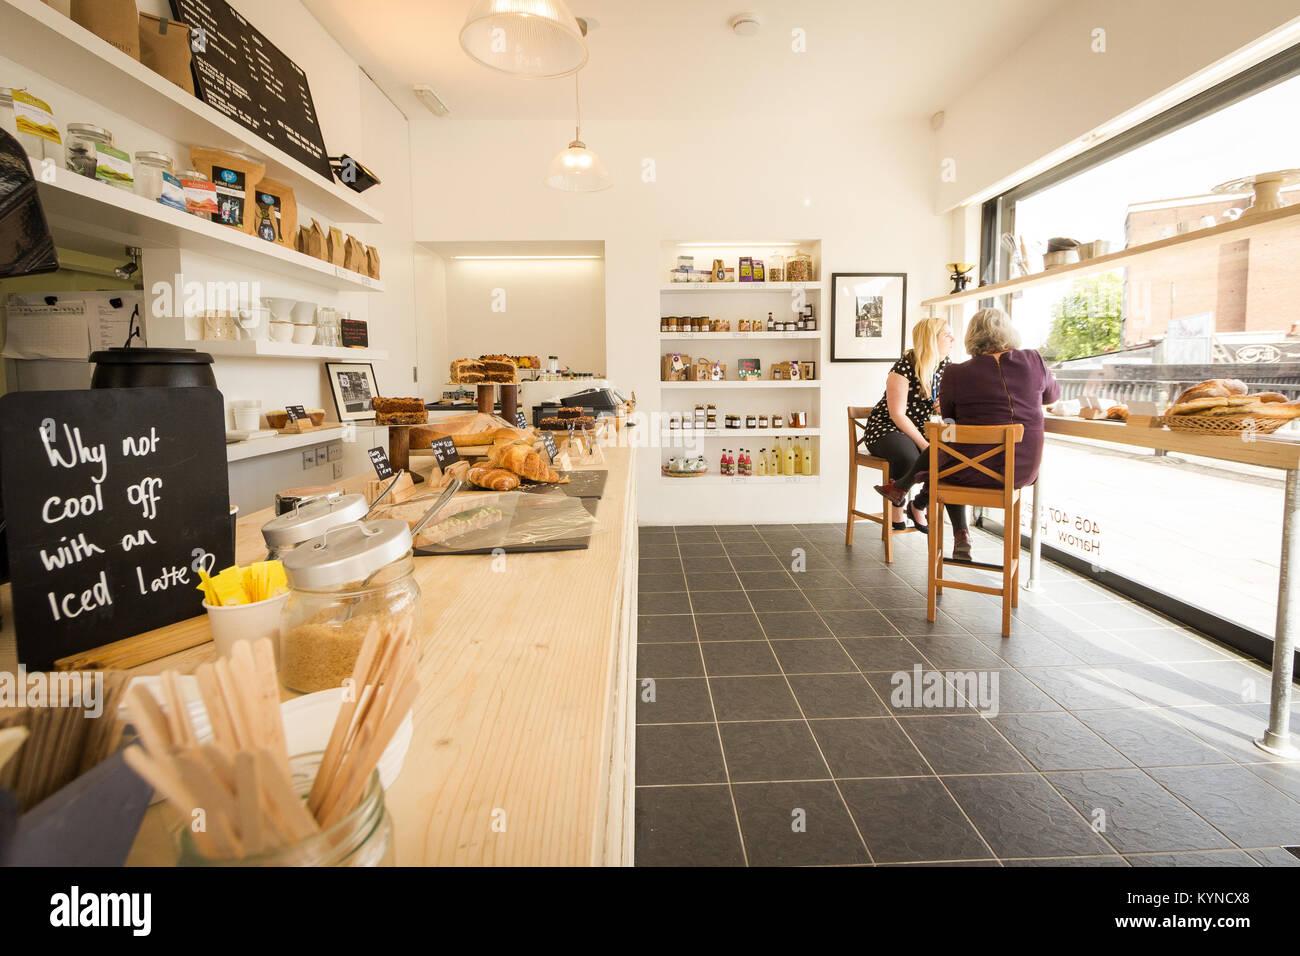 Artisan baker, Harrow, north west London UK - Stock Image